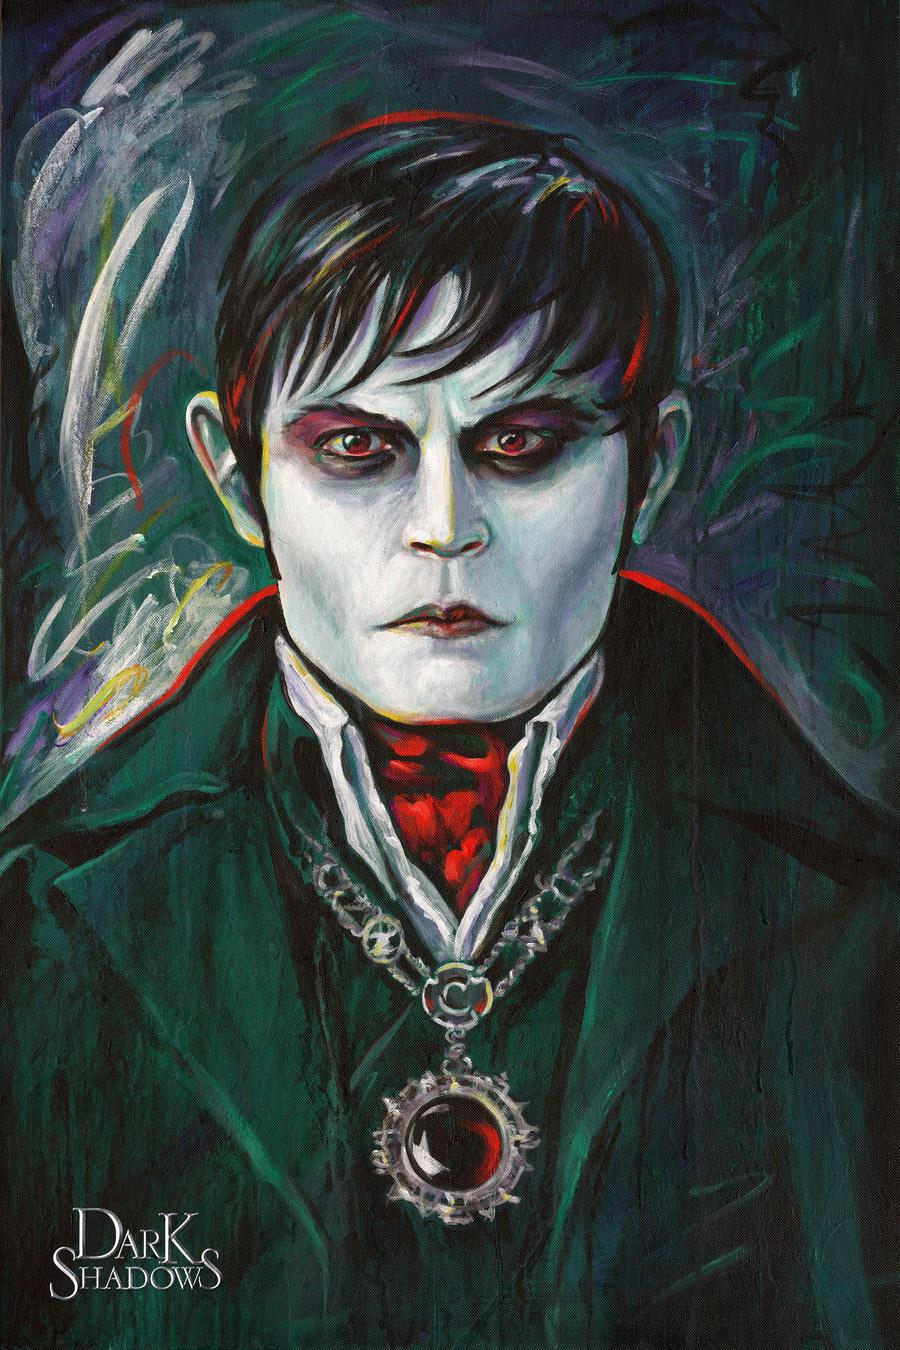 Depp as Barnabas by 2B-inspired